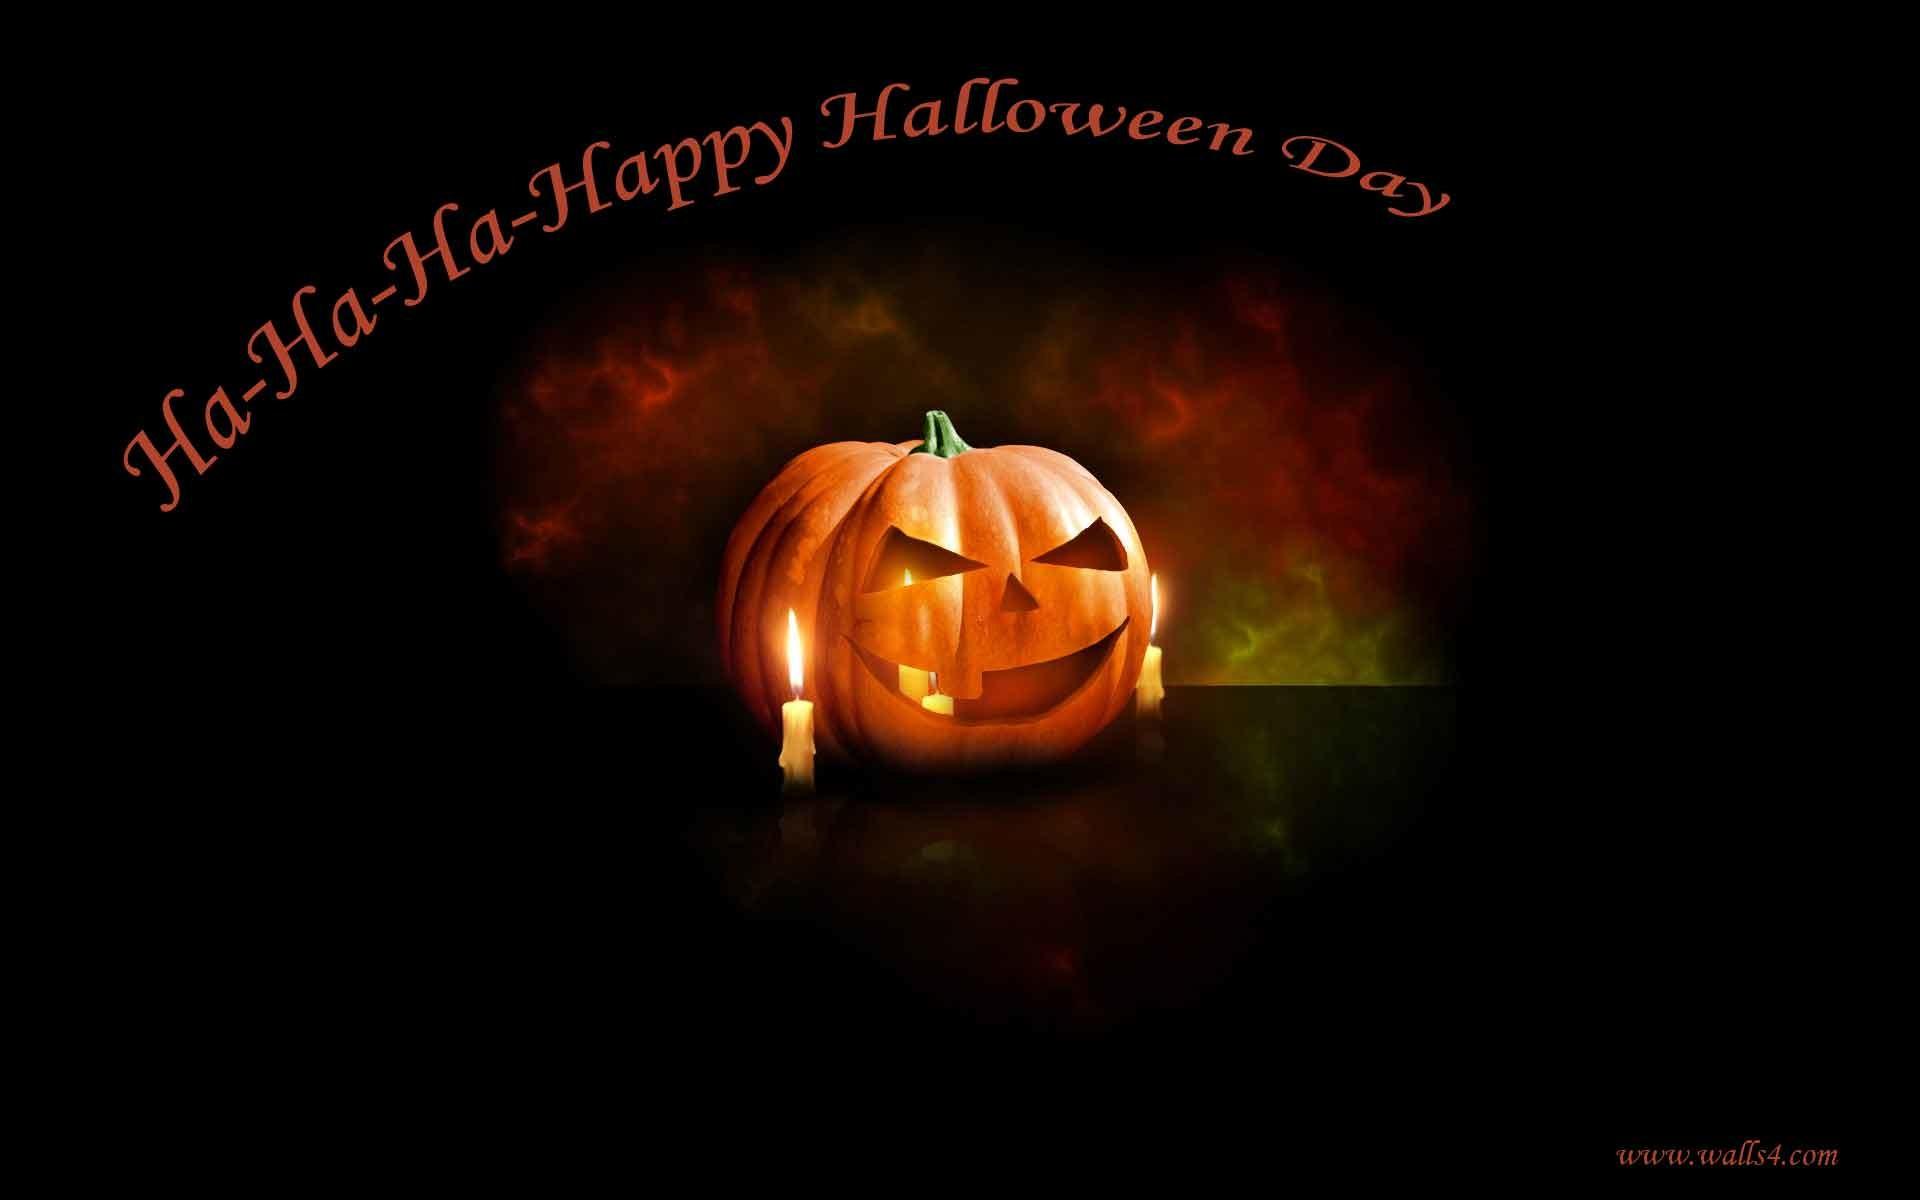 Free Wallpapers – Happy Halloween Day scary pumpkin wallpaper